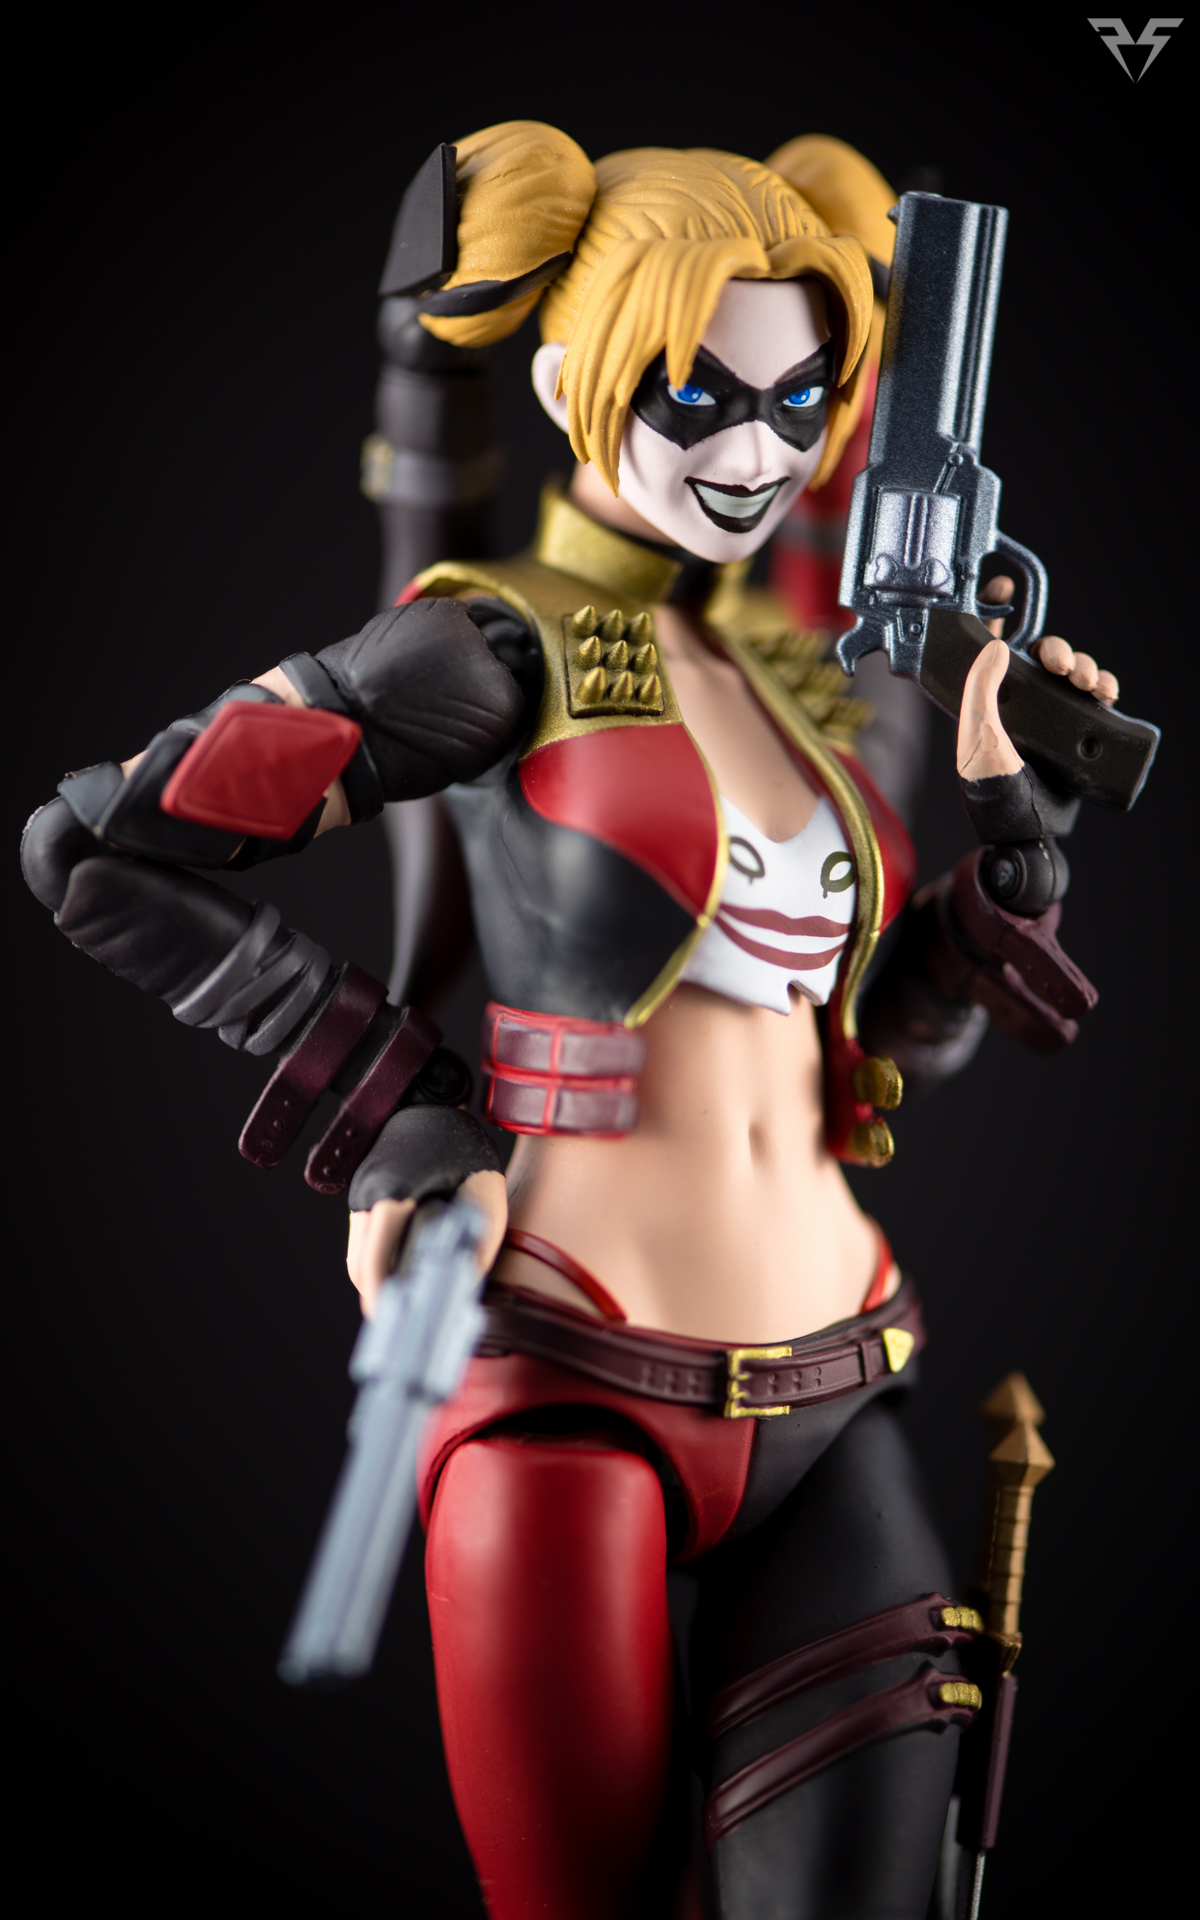 Figuarts Harley Quinn-4.jpg